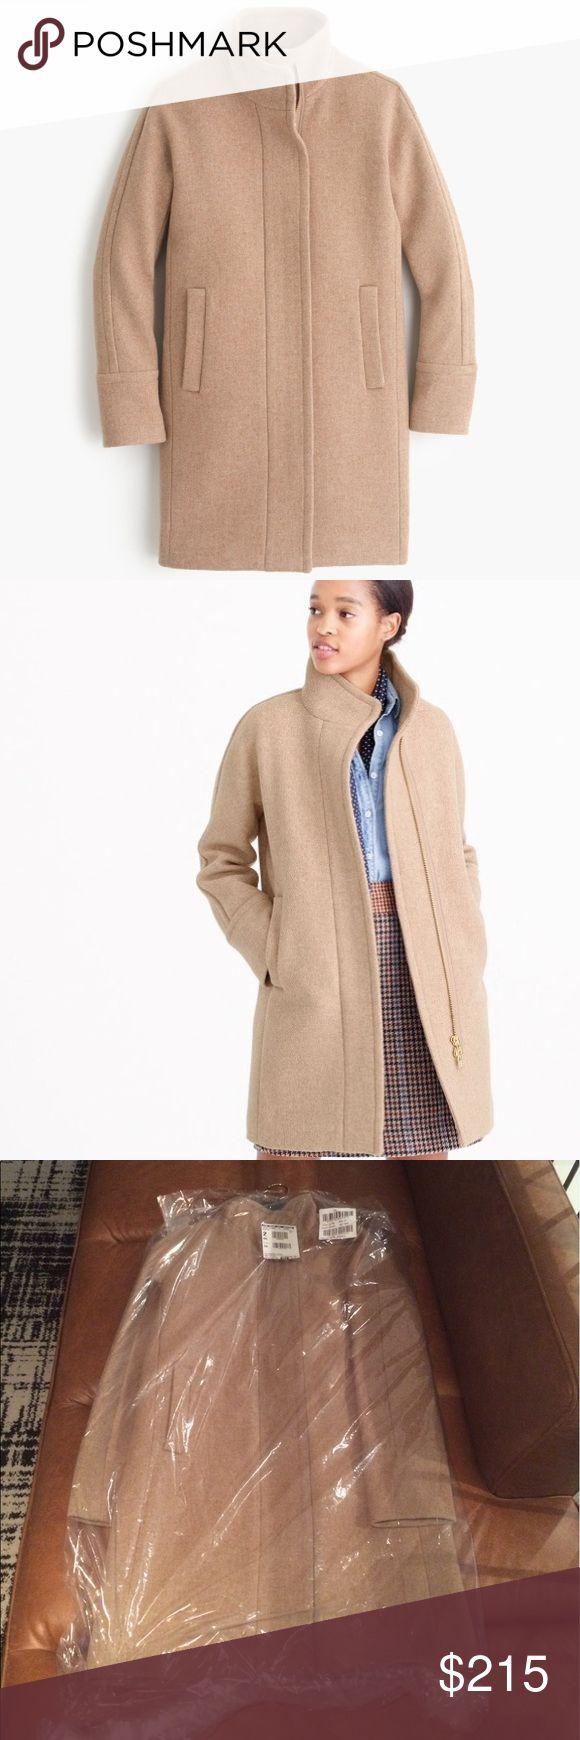 Spotted while shopping on Poshmark: J Crew Sandstone Wool Stadium Cocoon Coat 2 TALL! #poshmark #fashion #shopping #style #J. Crew #Jackets & Blazers